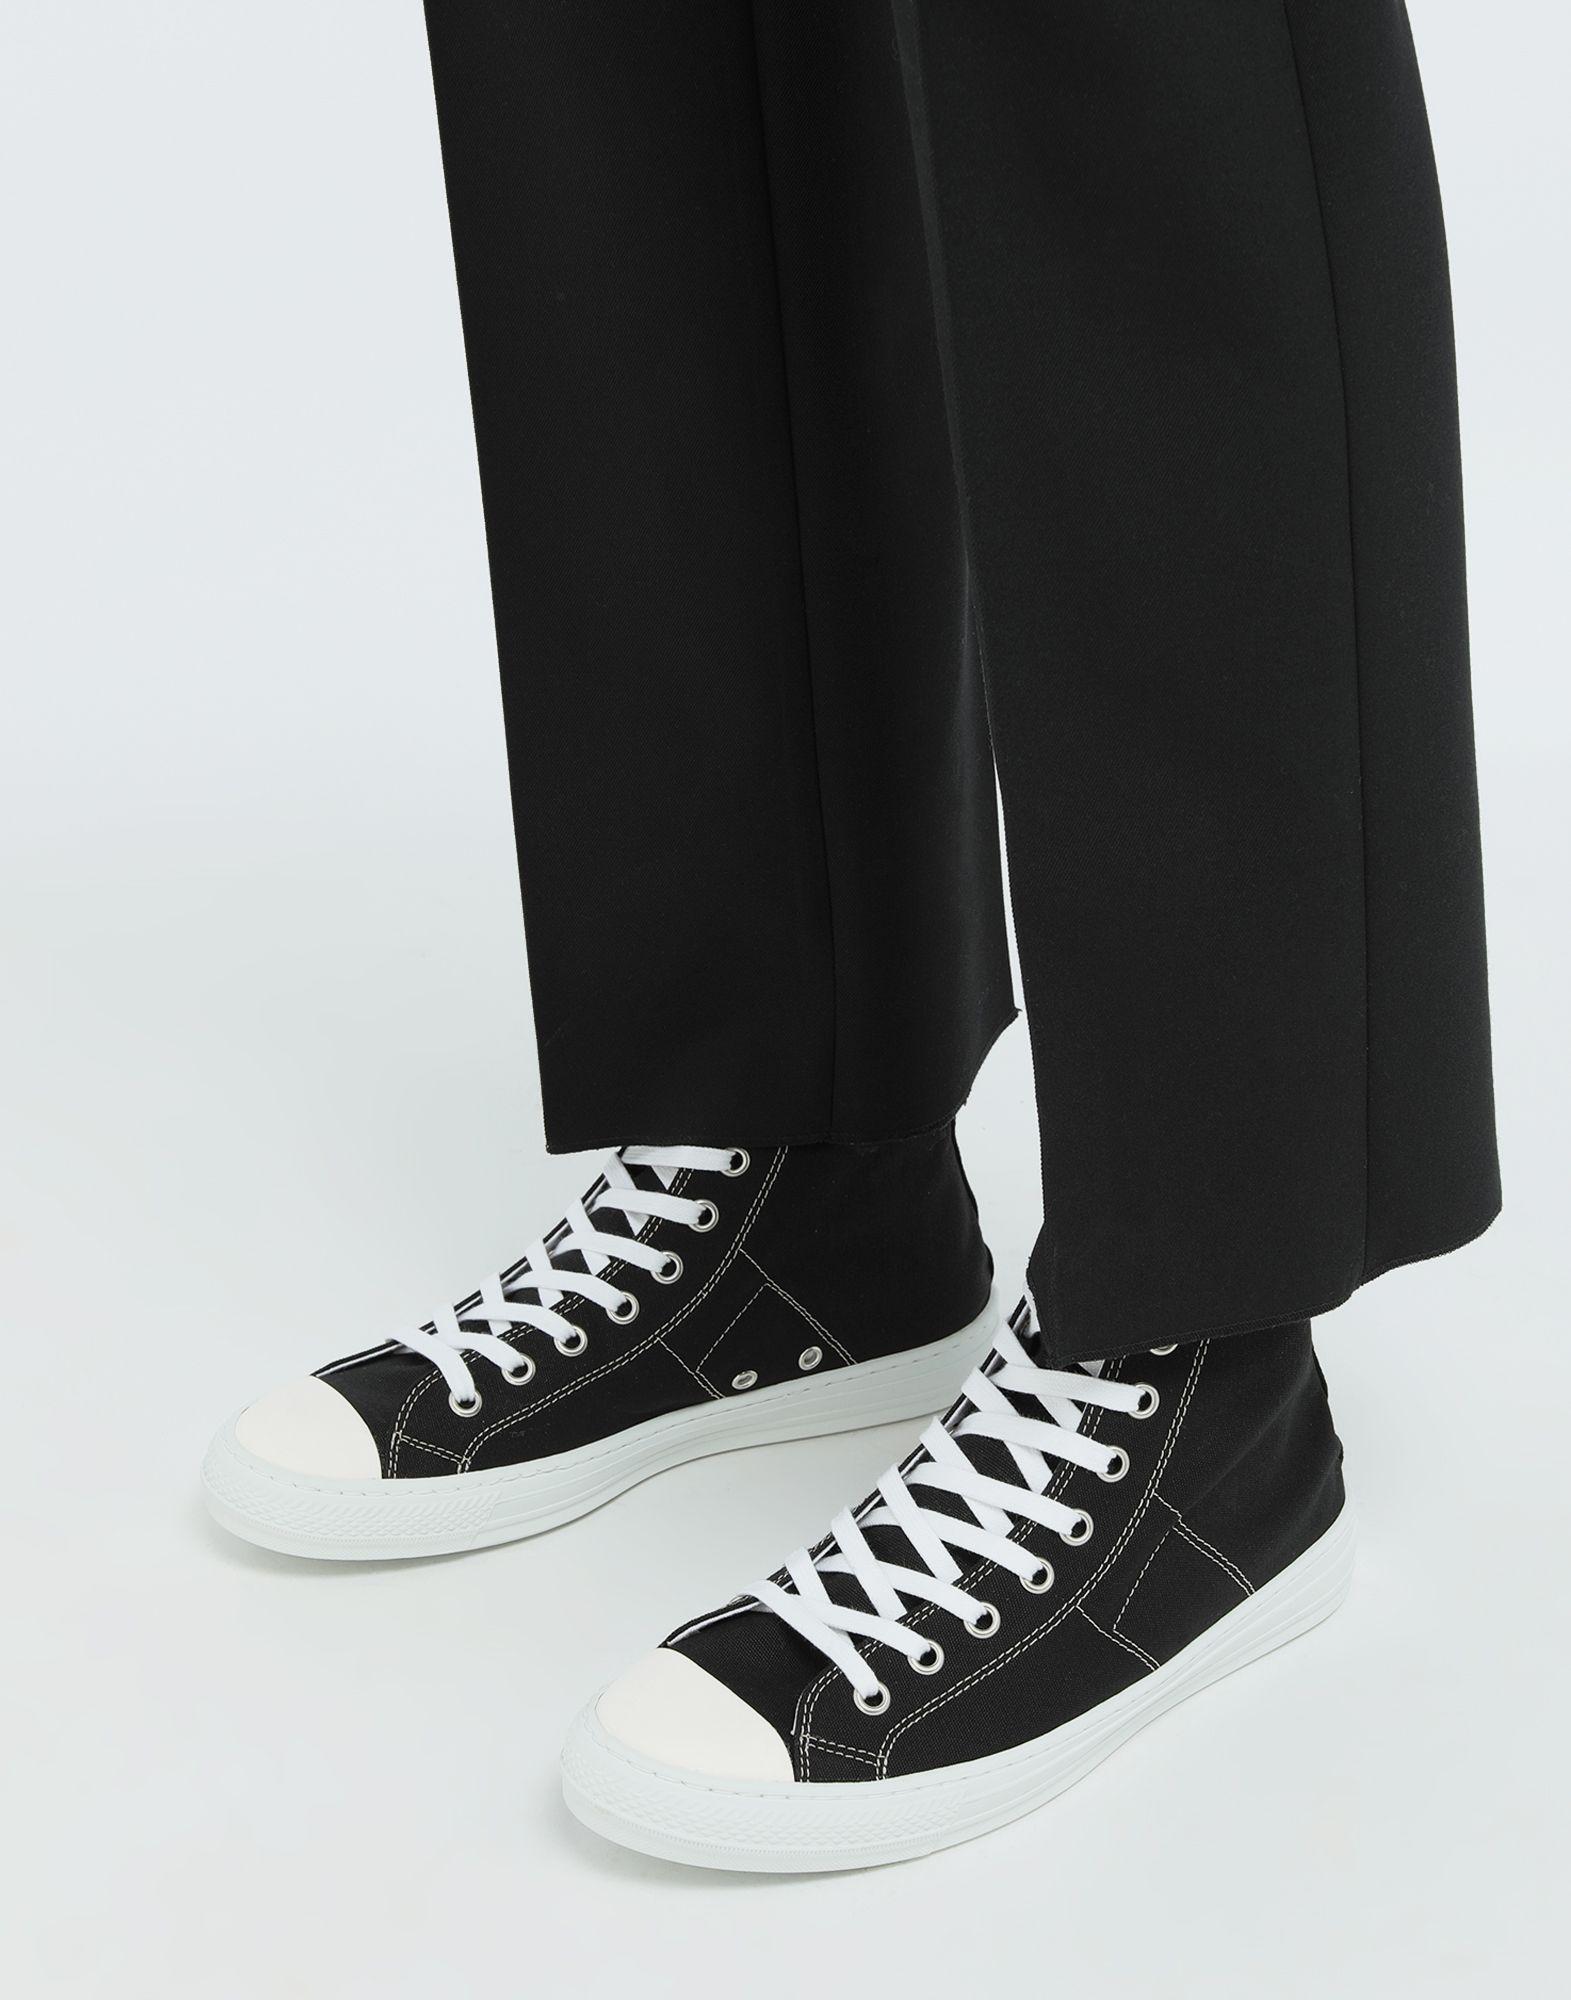 MAISON MARGIELA High-Top-Sneakers Stereotype Sneakers Herren b